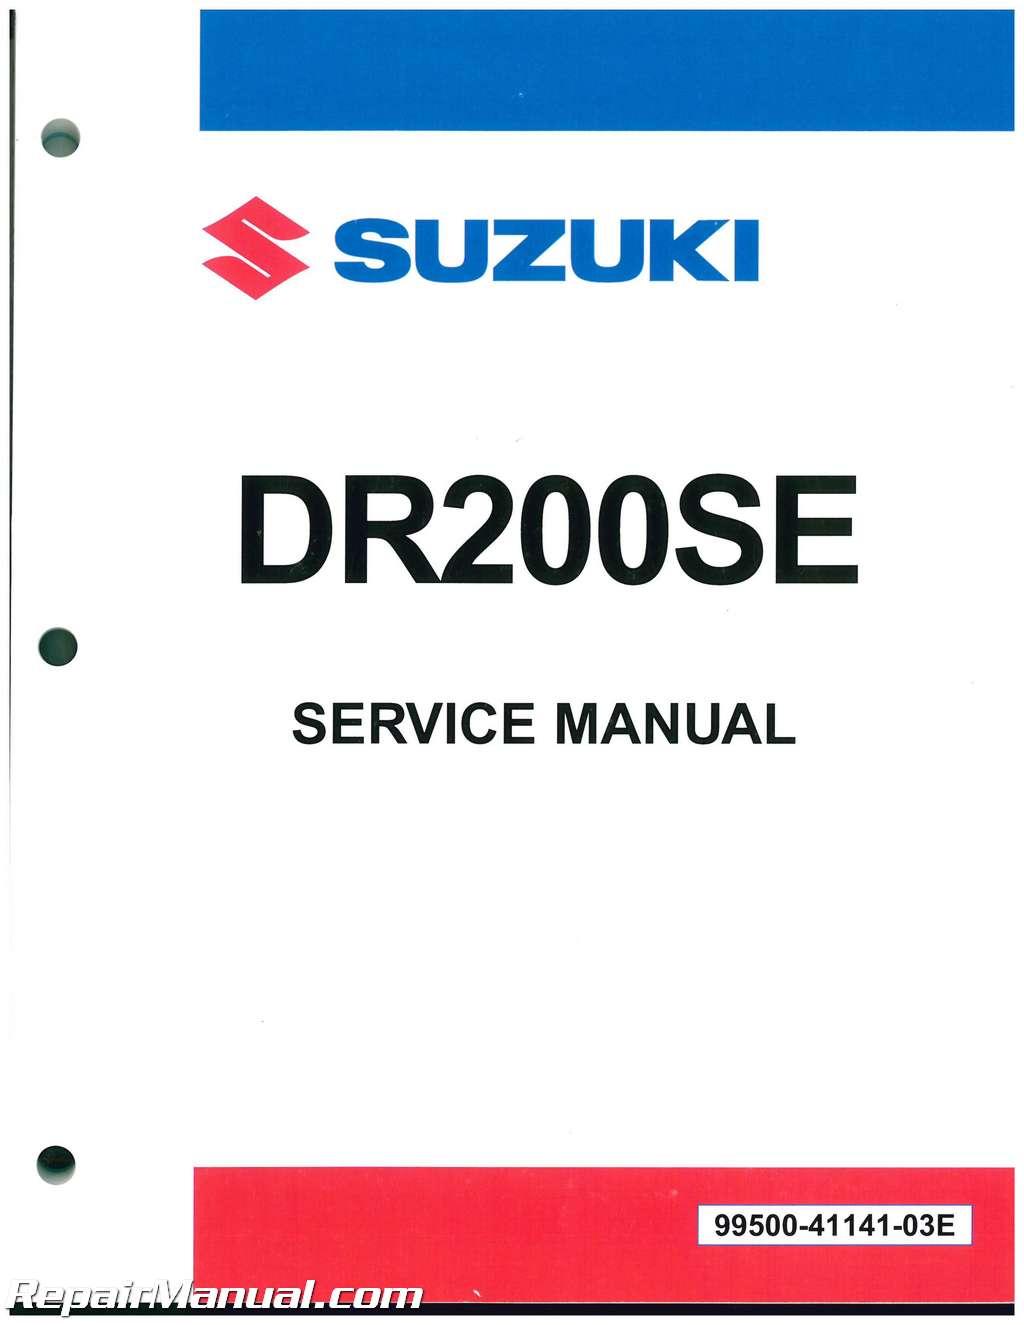 suzuki dl1000 v storm 2002 factory service repair manual